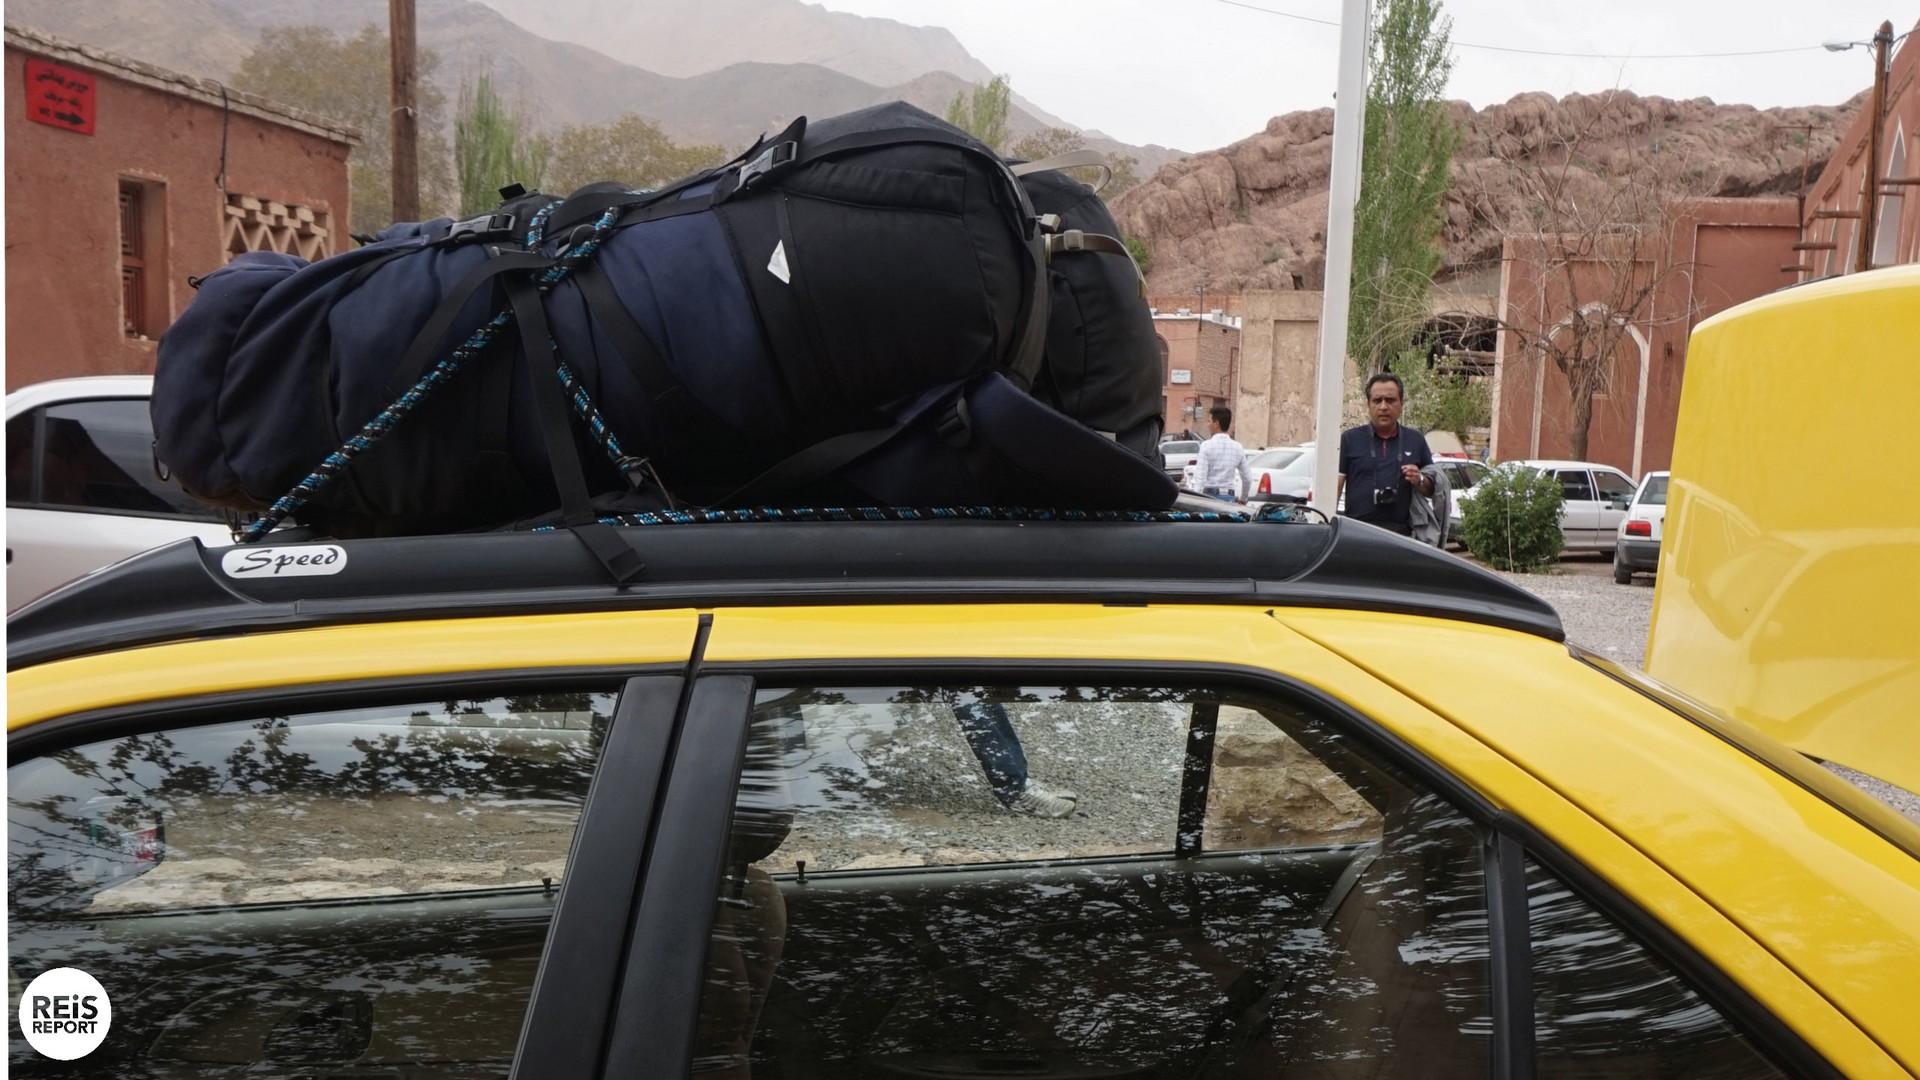 abyaneh iran bezoeken